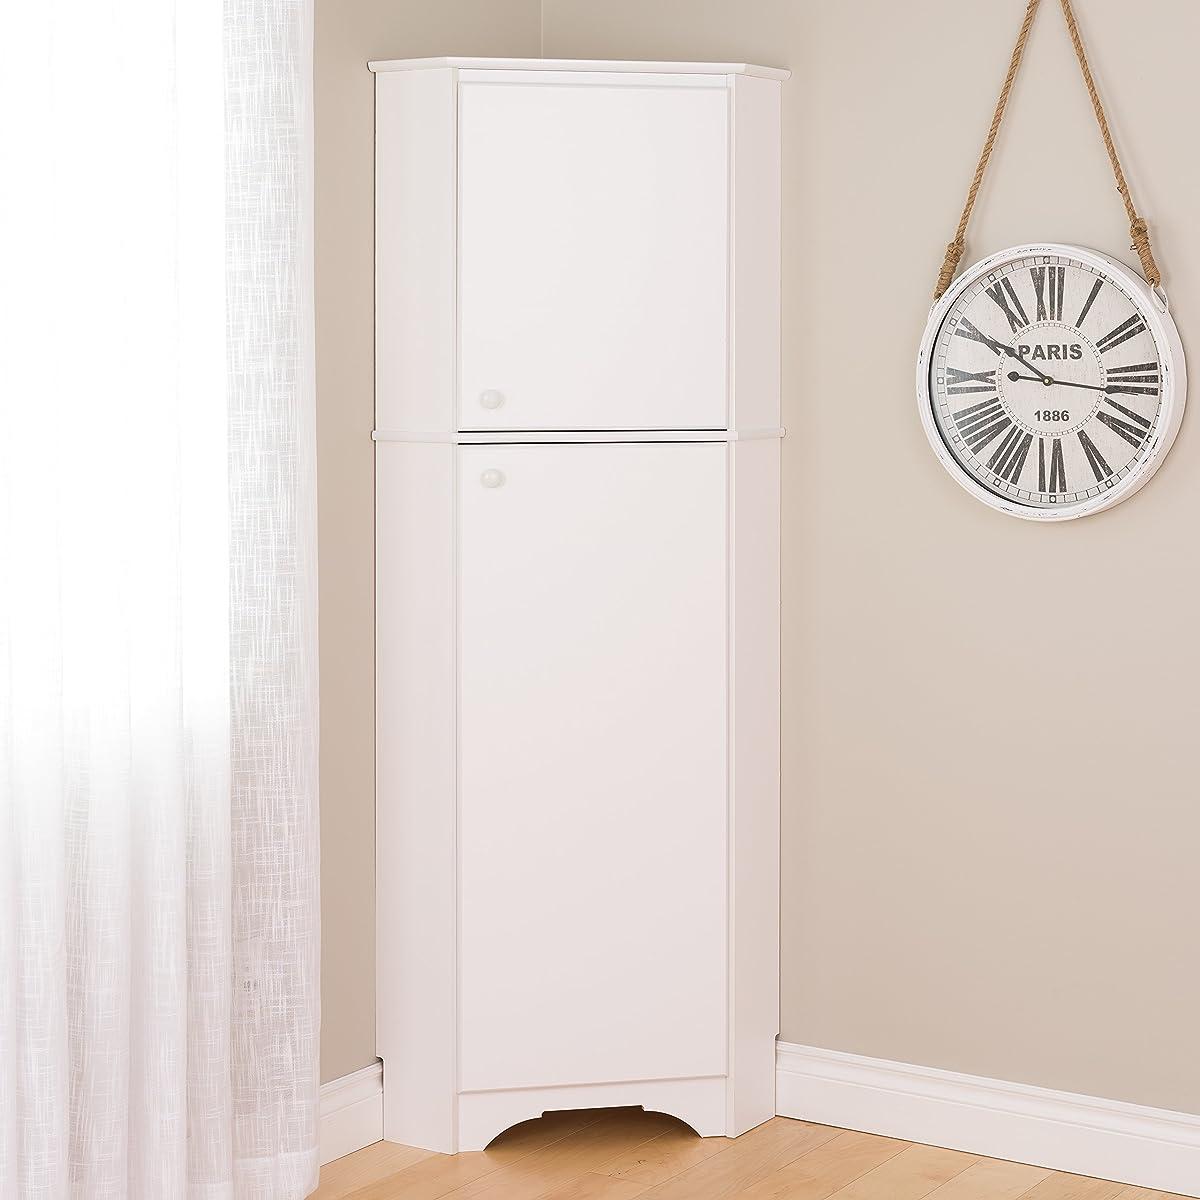 Prepac WSCC-0605-1 Home, Elite Tall 2-Door Corner Storage Cabinet, White